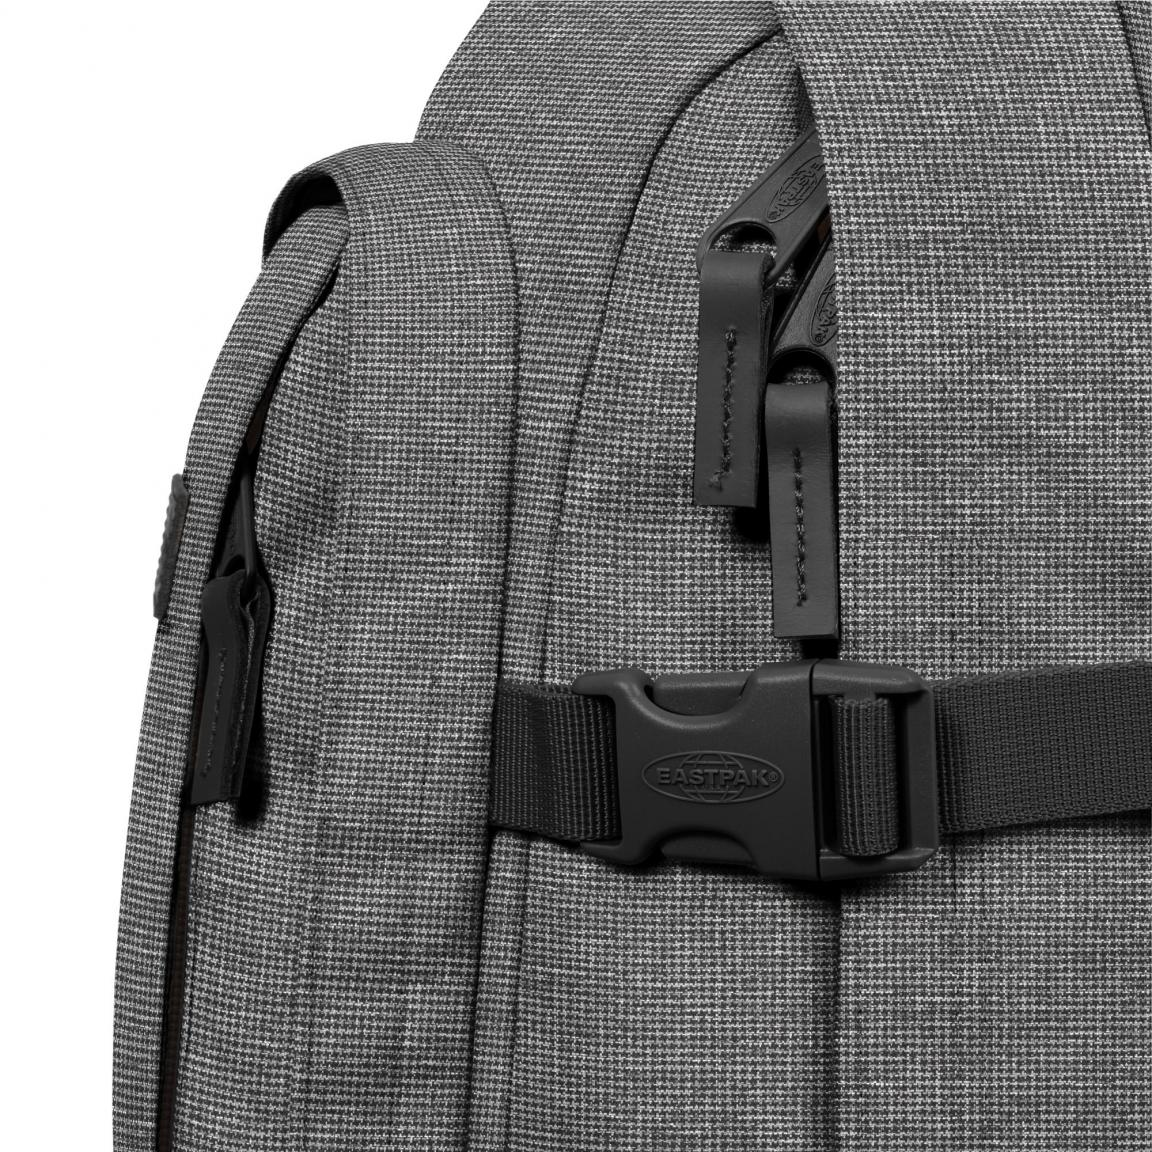 690a985f924 Laptoprucksack Eastpak Evanz dunkelgrau Black Denim - Bags & more